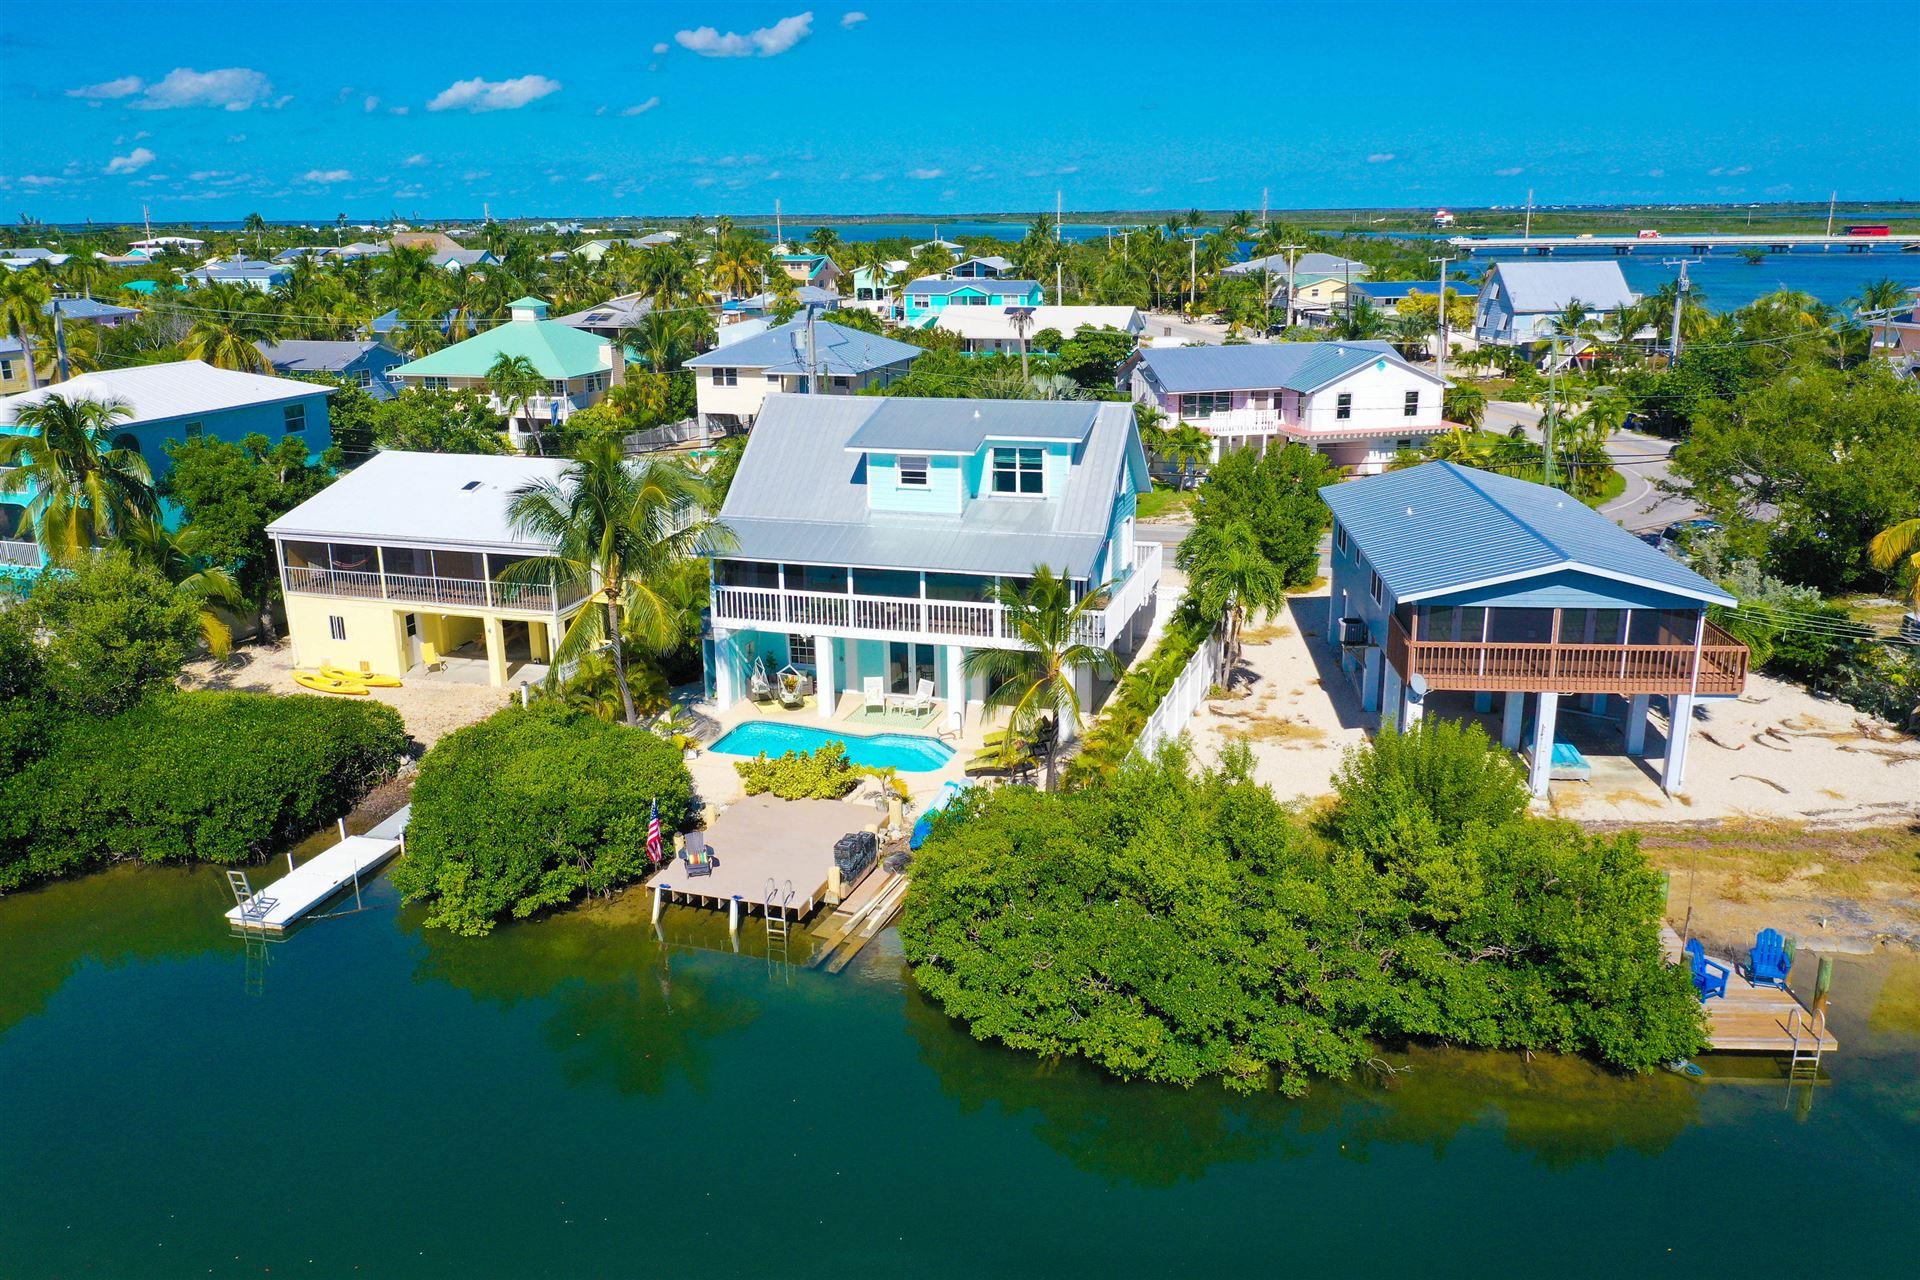 321 W Indies Drive, Summerland Key, FL 33042 - #: 588362